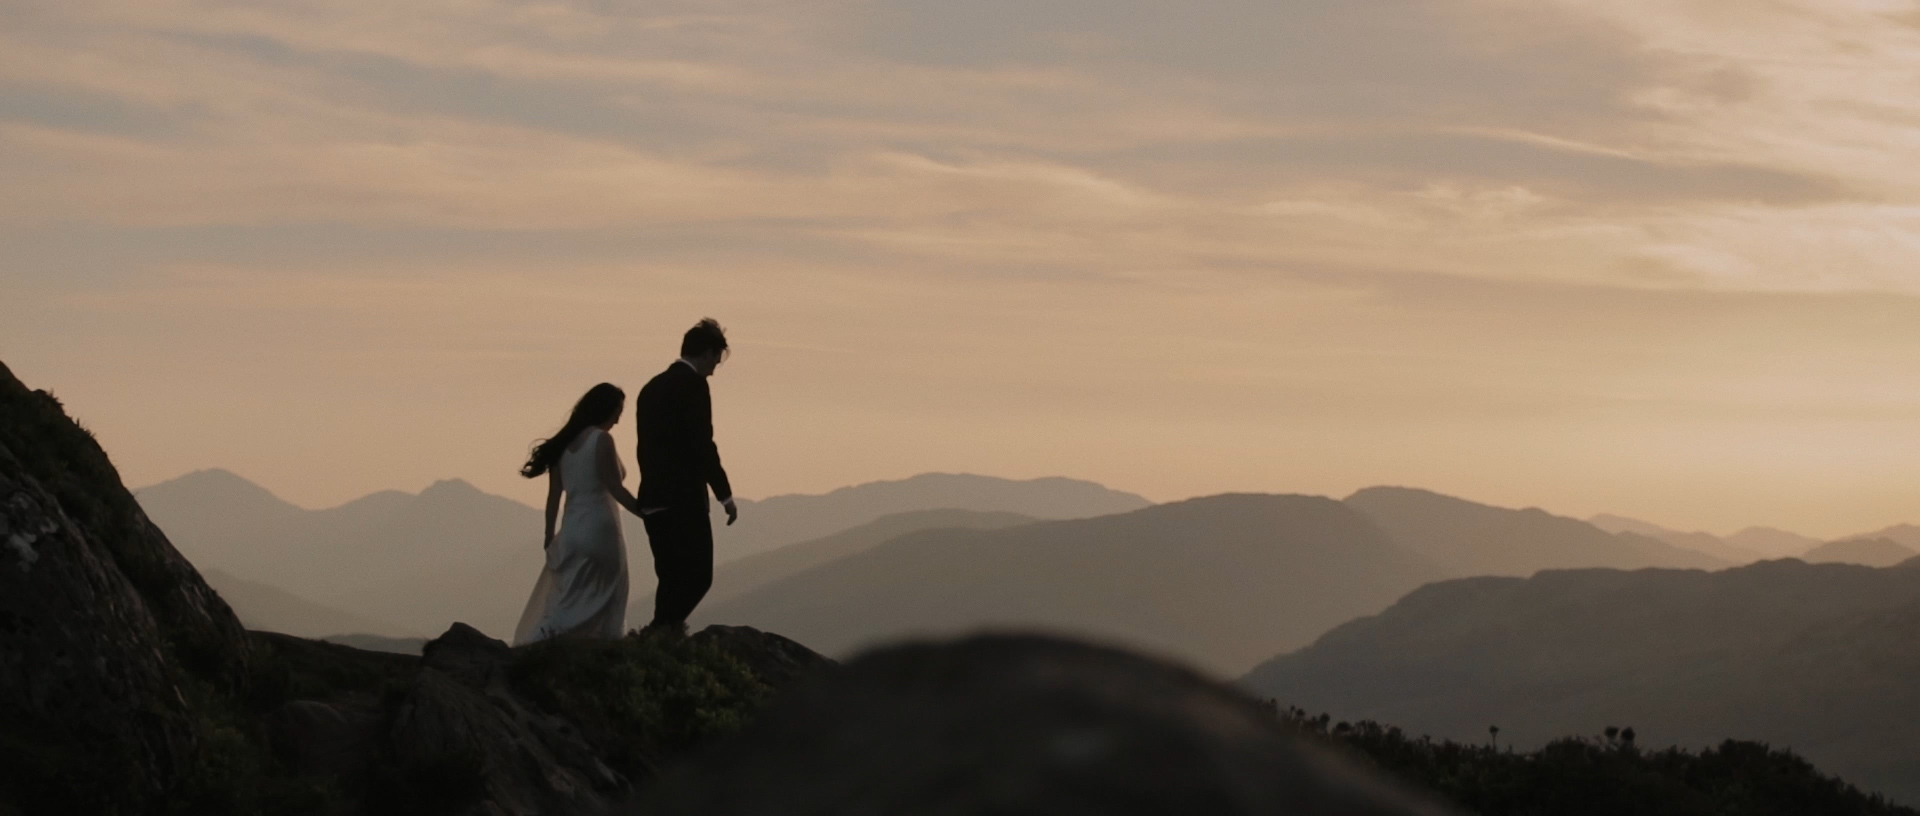 pollokshields-burgh-hall-wedding-videographer_LL_01.jpg